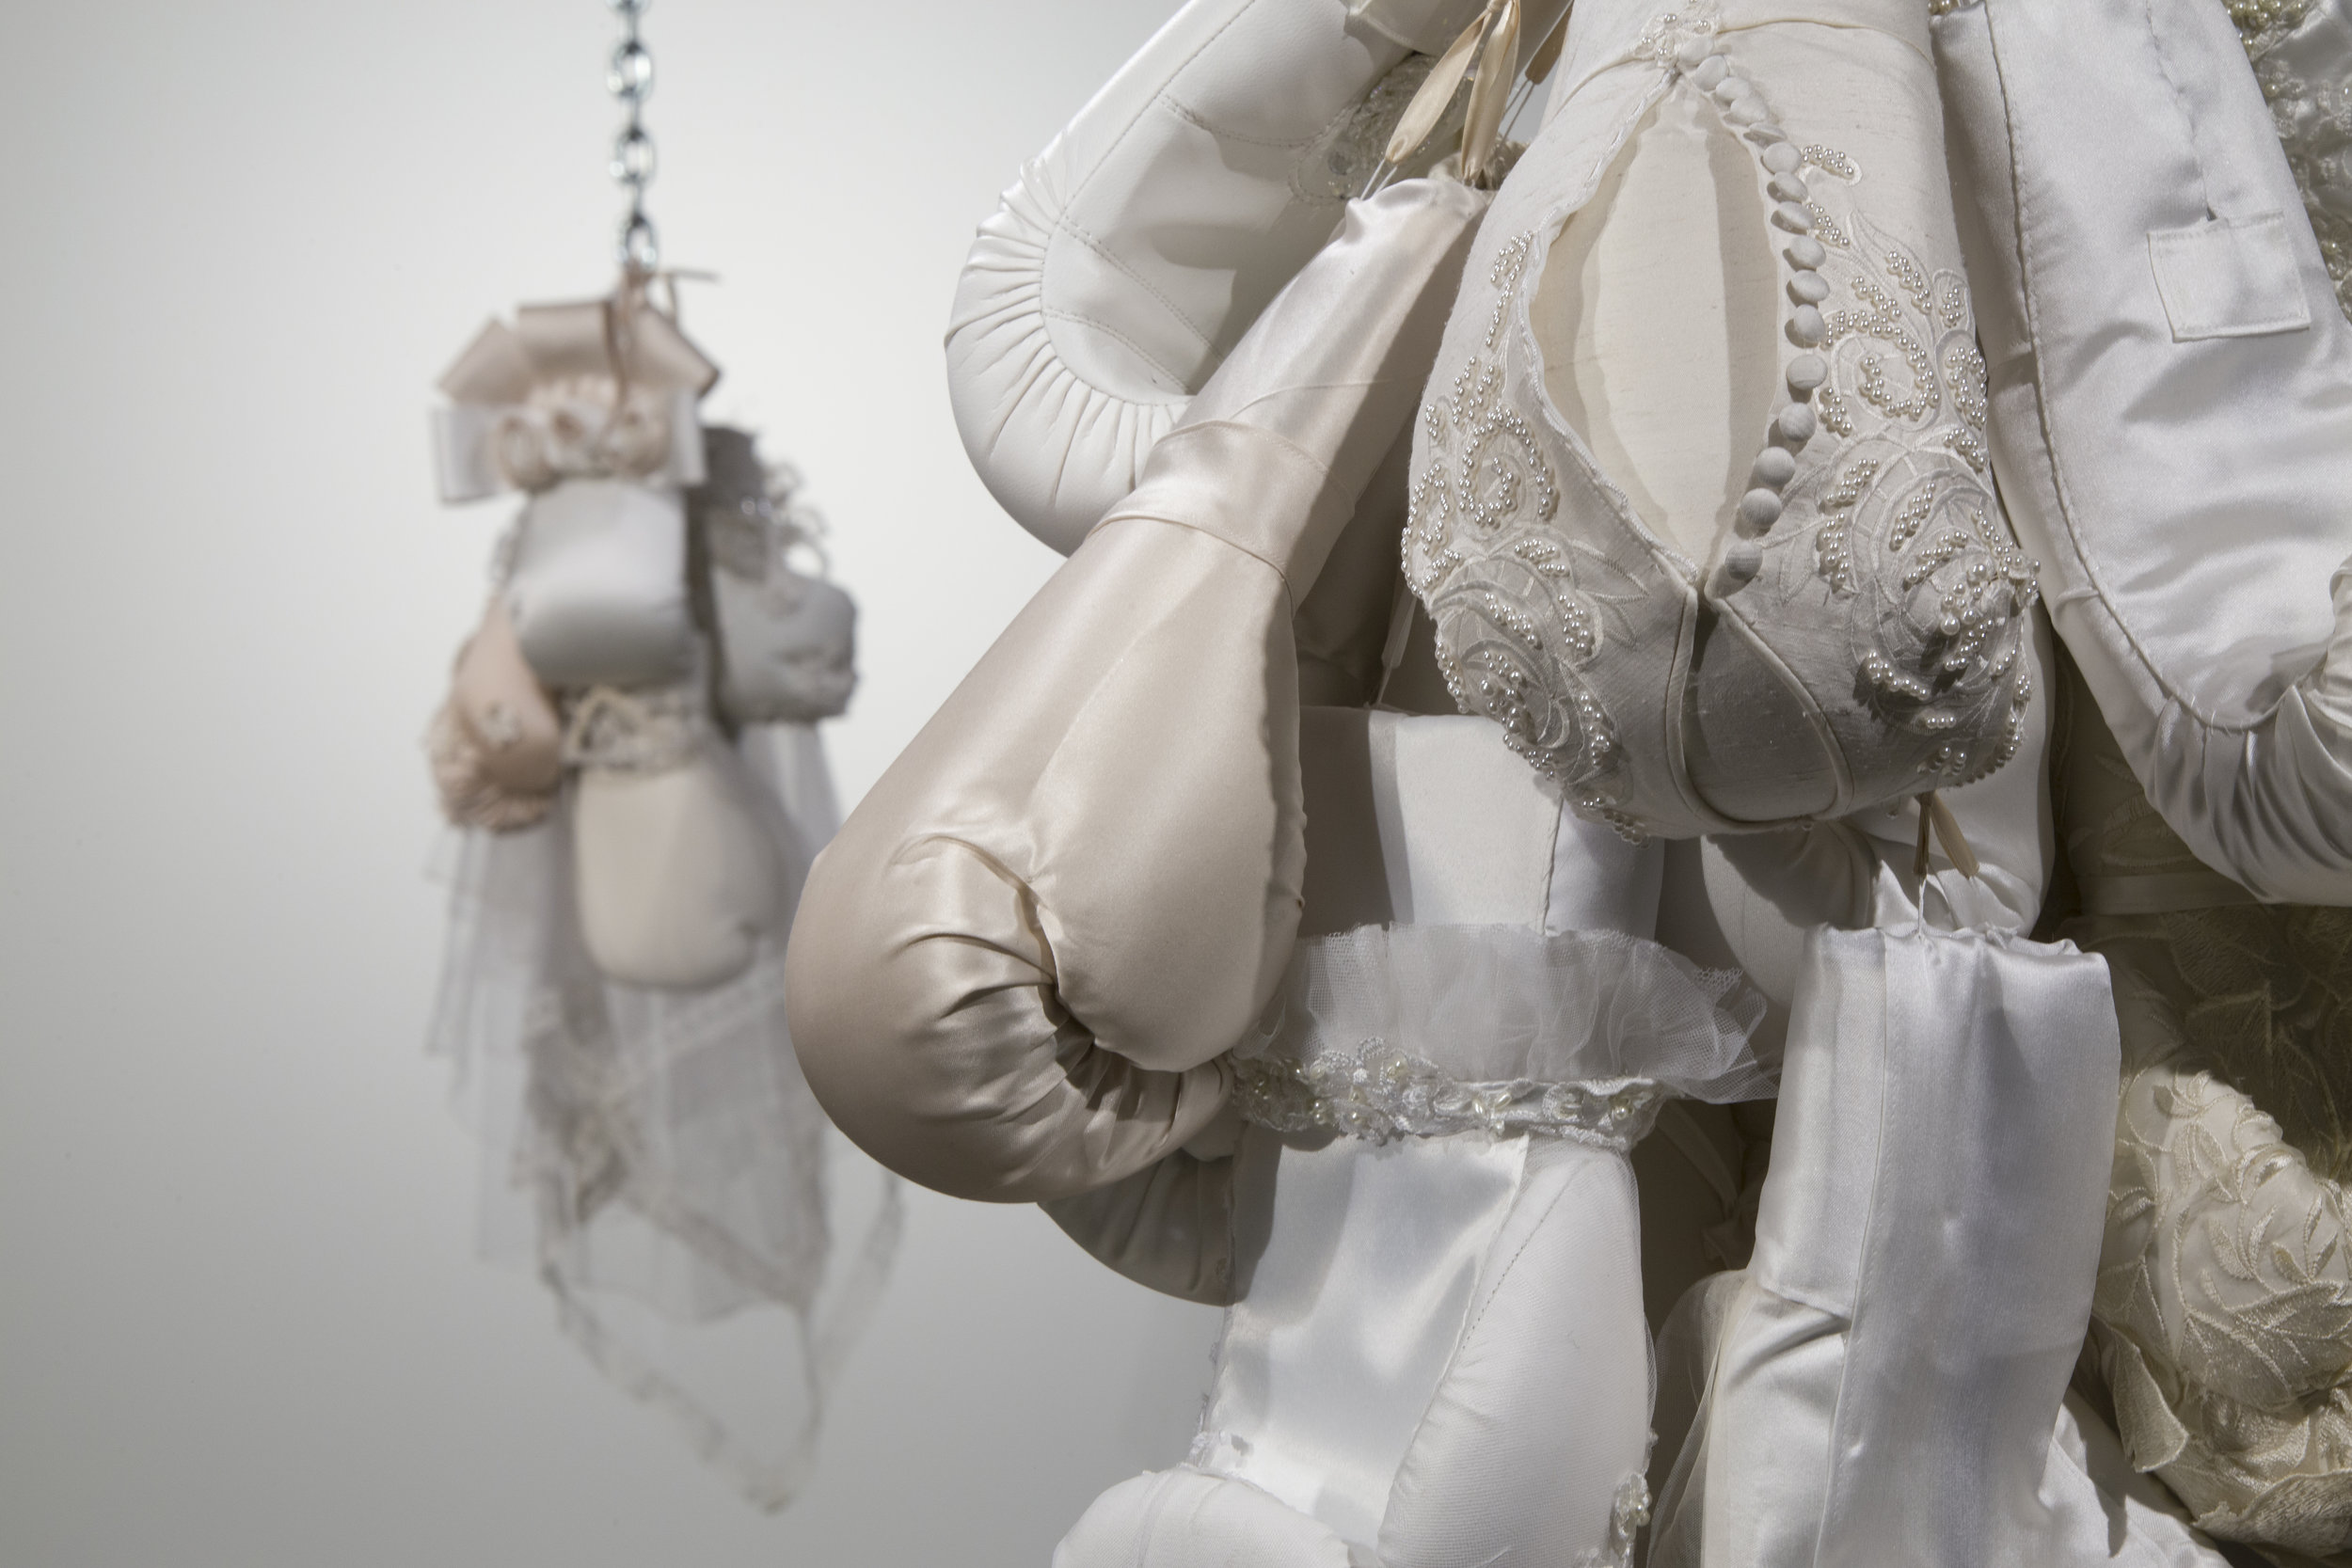 Phase II Zoë Buckman: Imprison Her Soft Hand